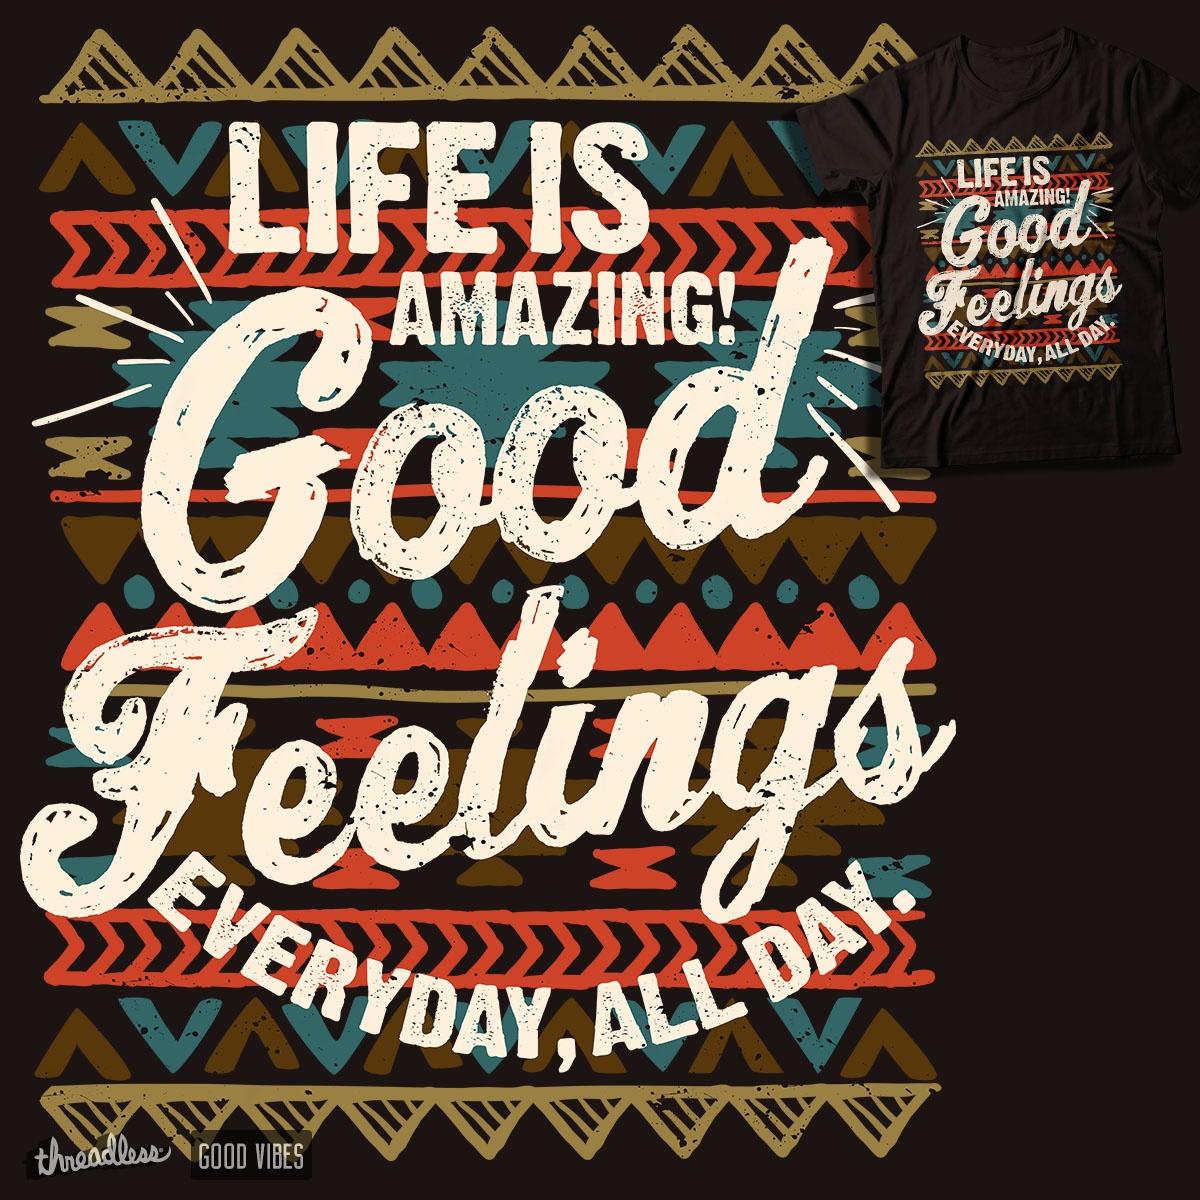 Good Feelings, Good Vibes! by Agimat ni Ingkong on Threadless